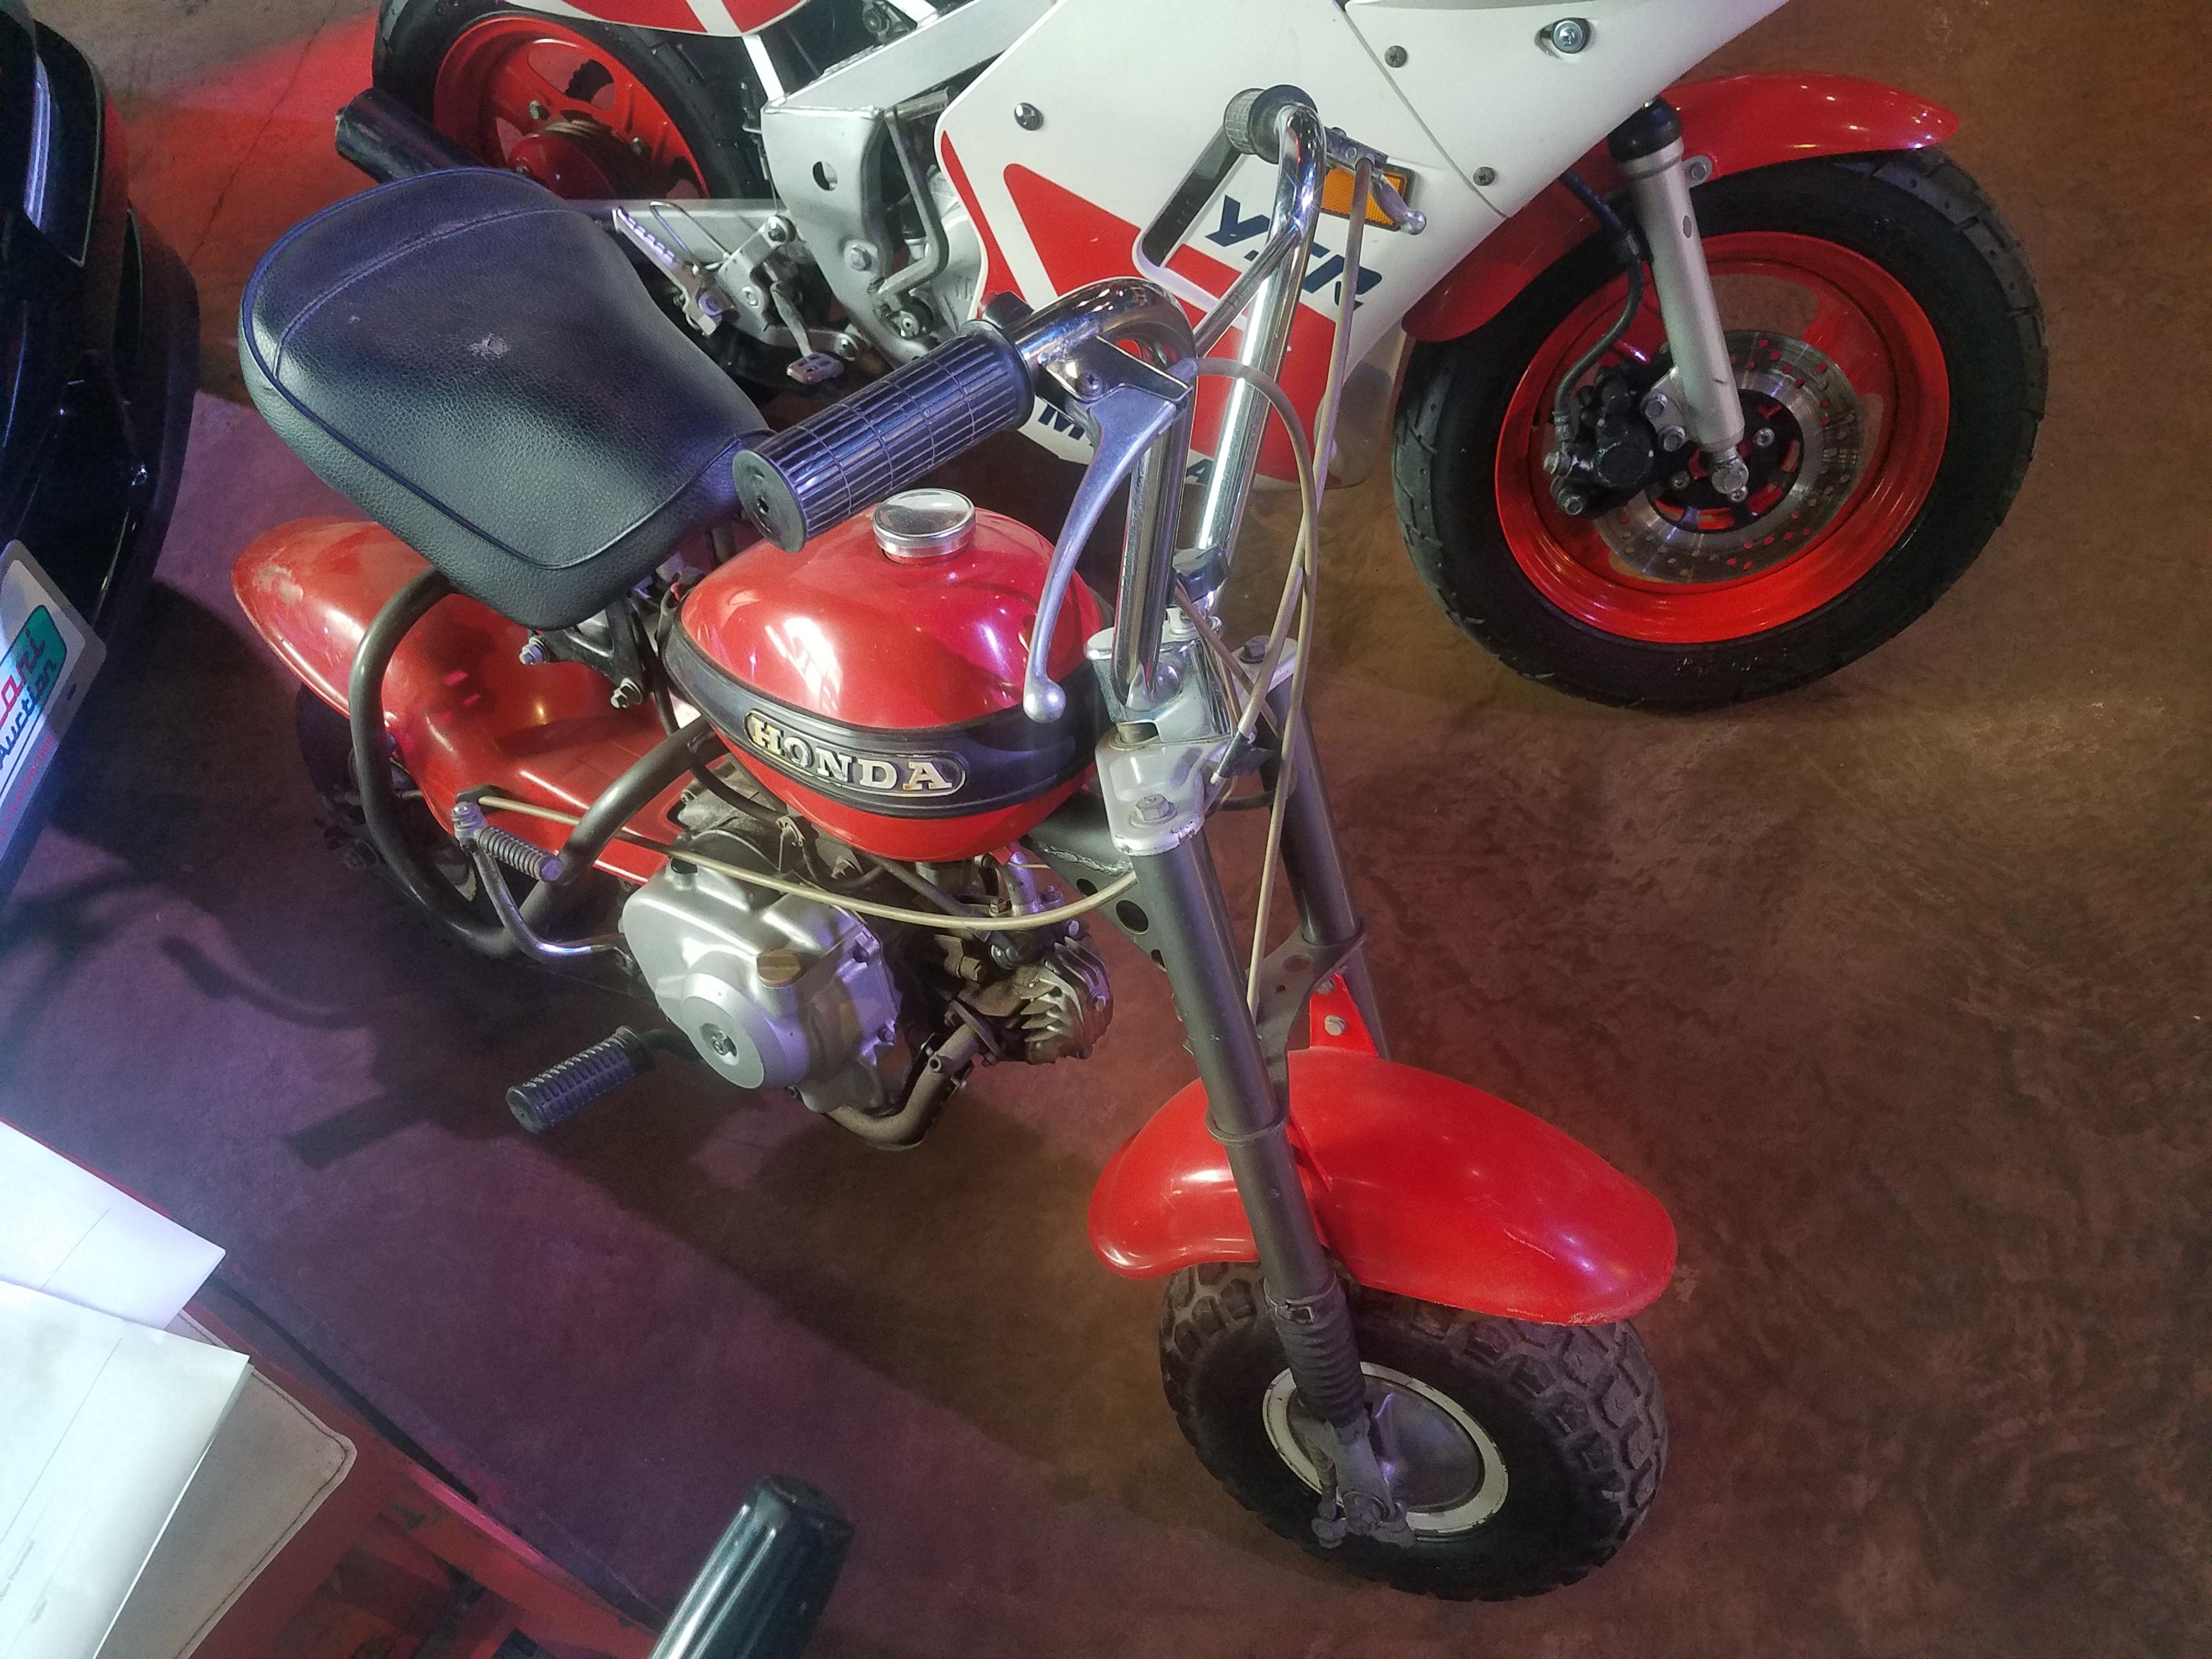 85 1970 Mini Trail Honda Z50 Motorcycle Ct 70 Bike 1st Image Of A 50